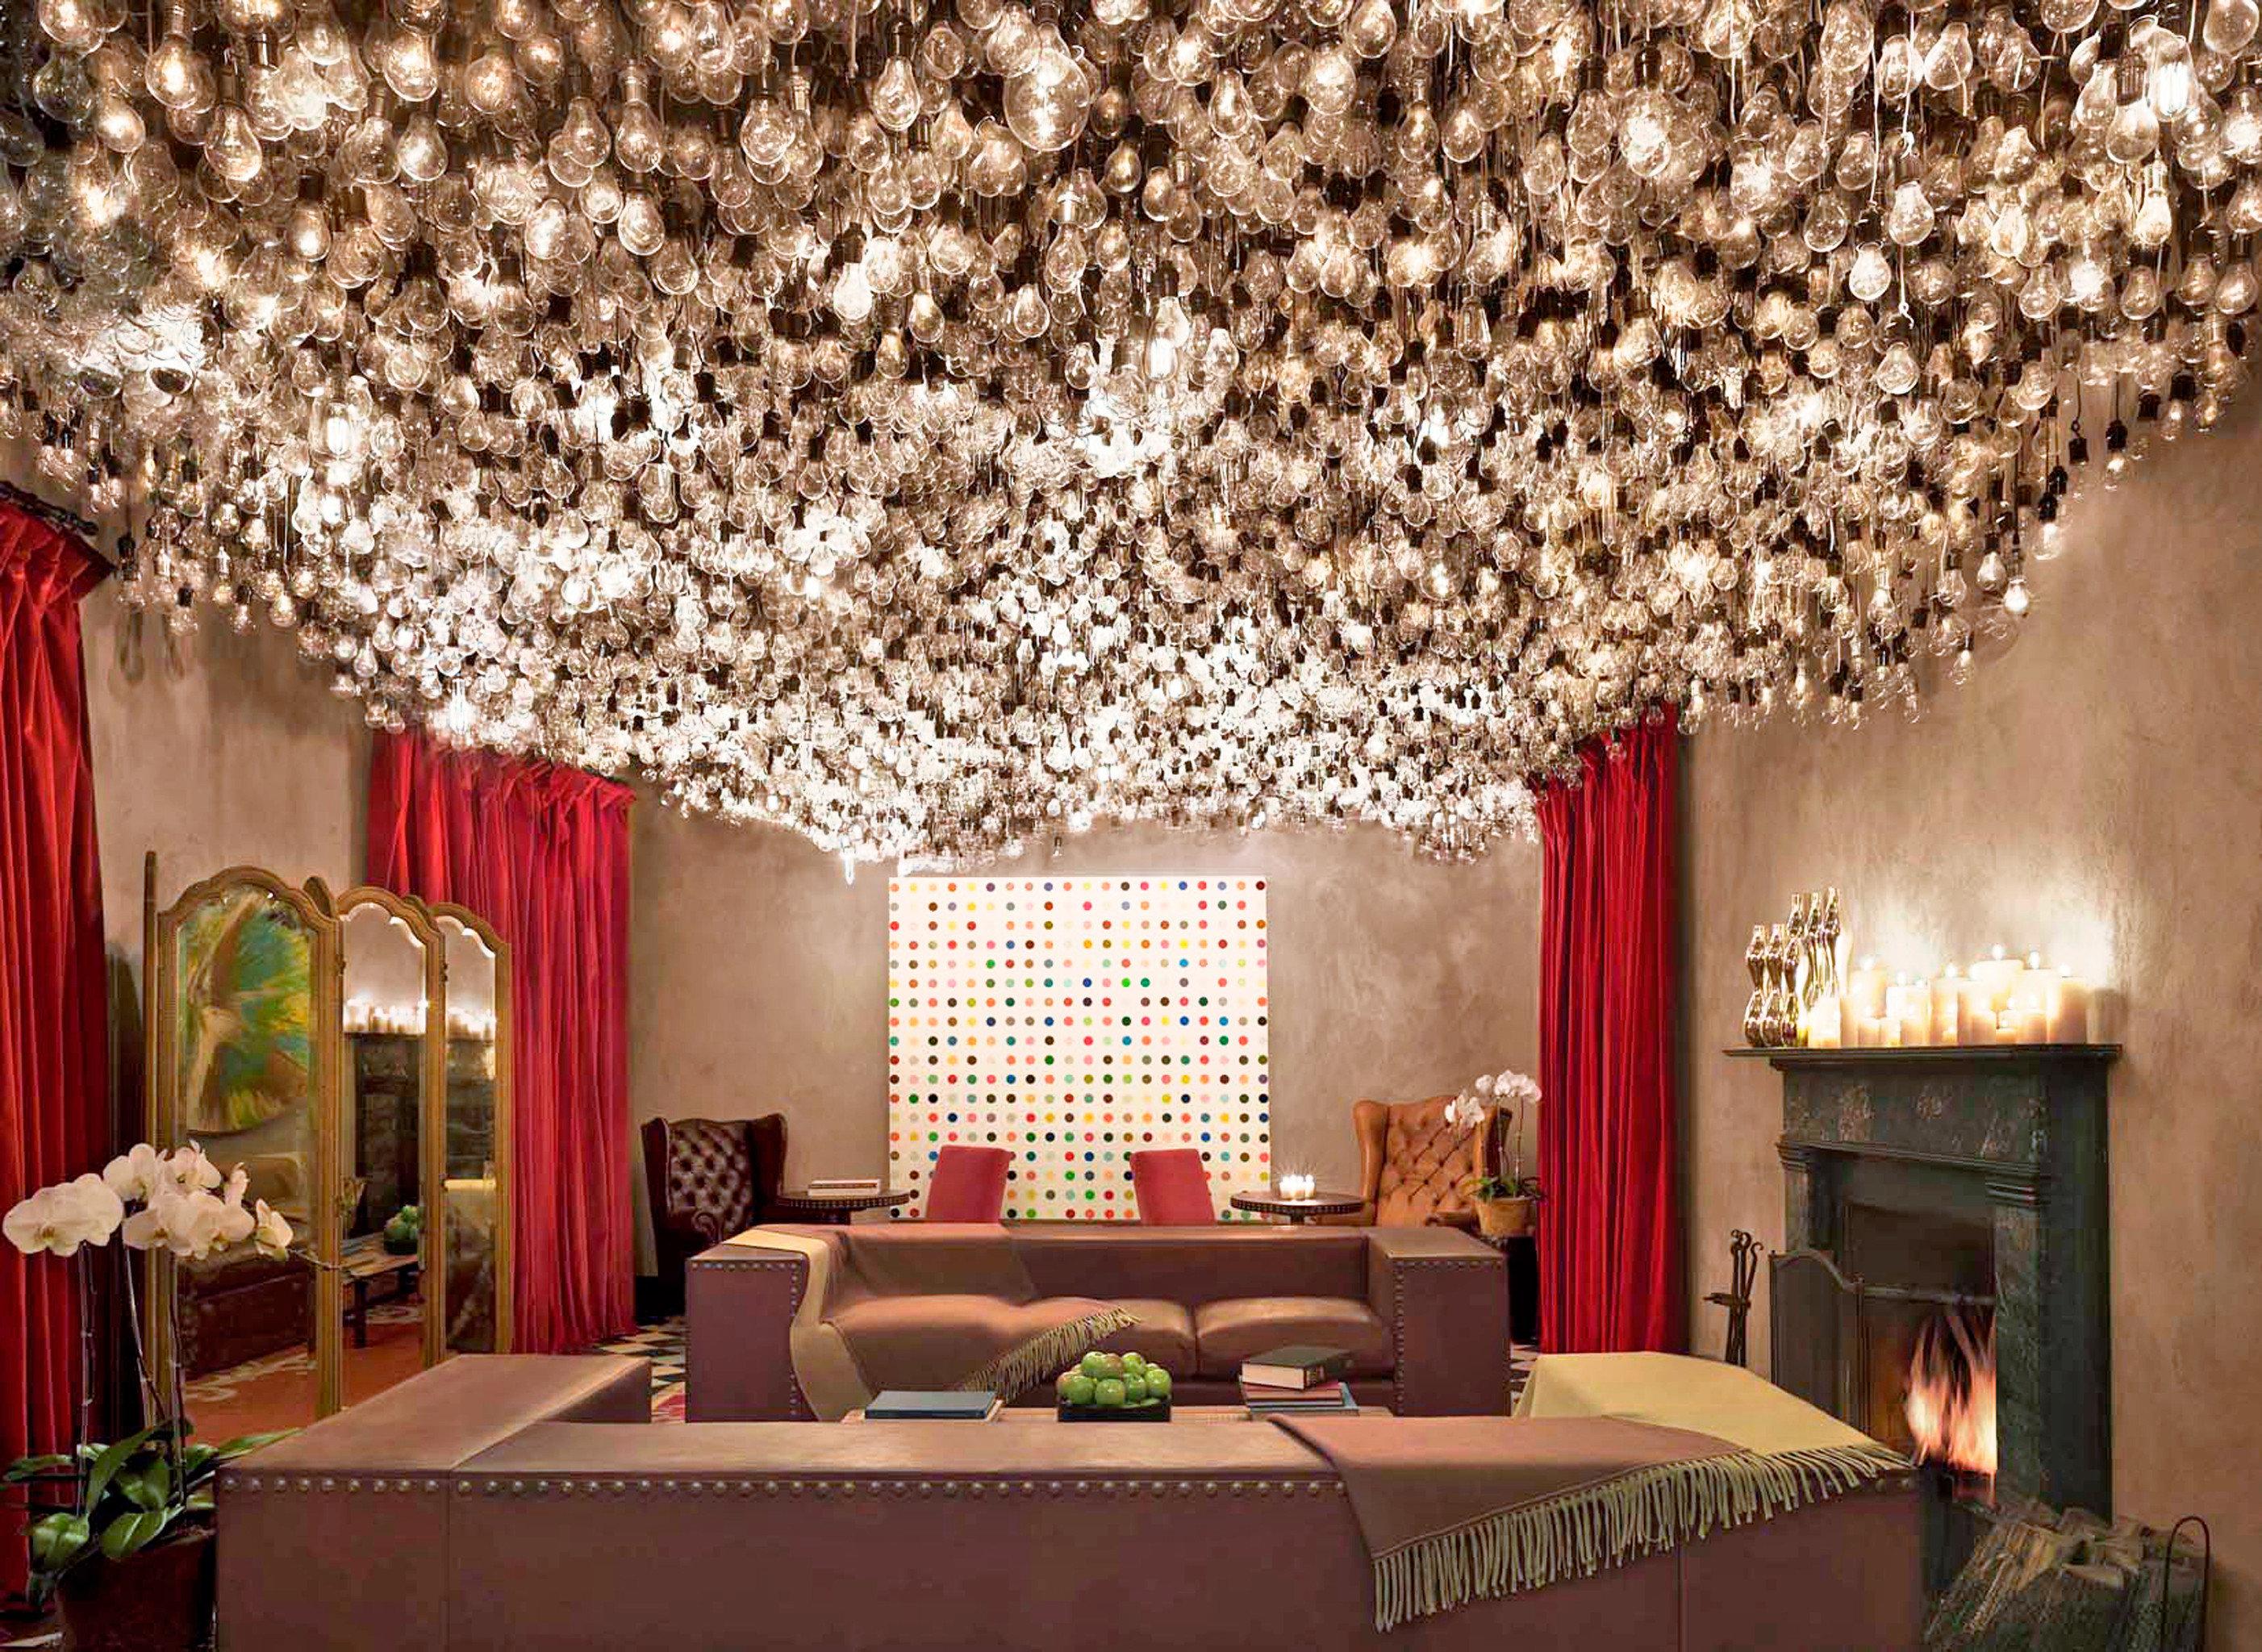 City Hotels Lounge Luxury Luxury Travel Romance Romantic Hotels living room lighting